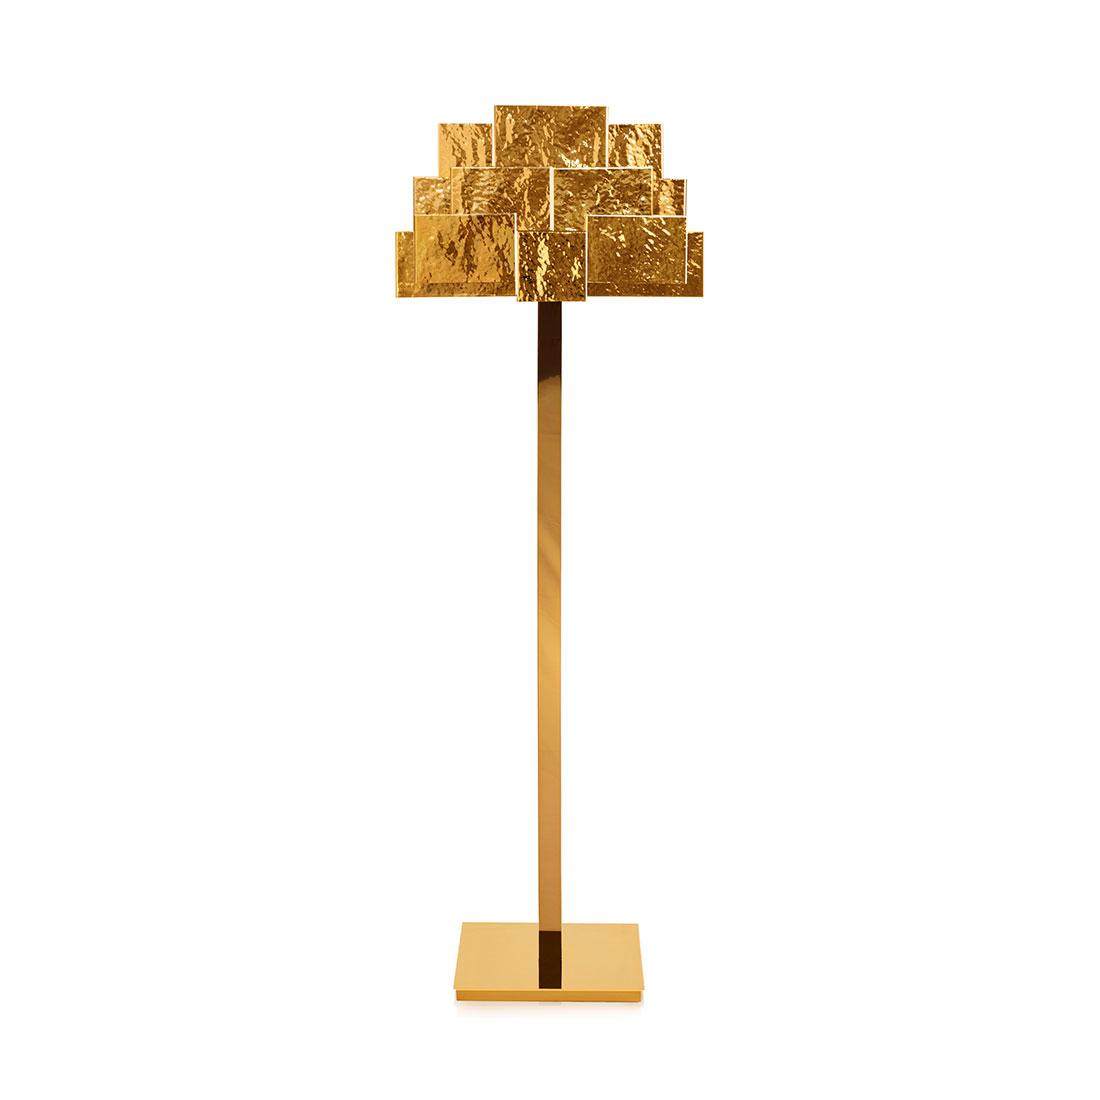 Inspiring Trees floor lamp InsidherLand brass lighting